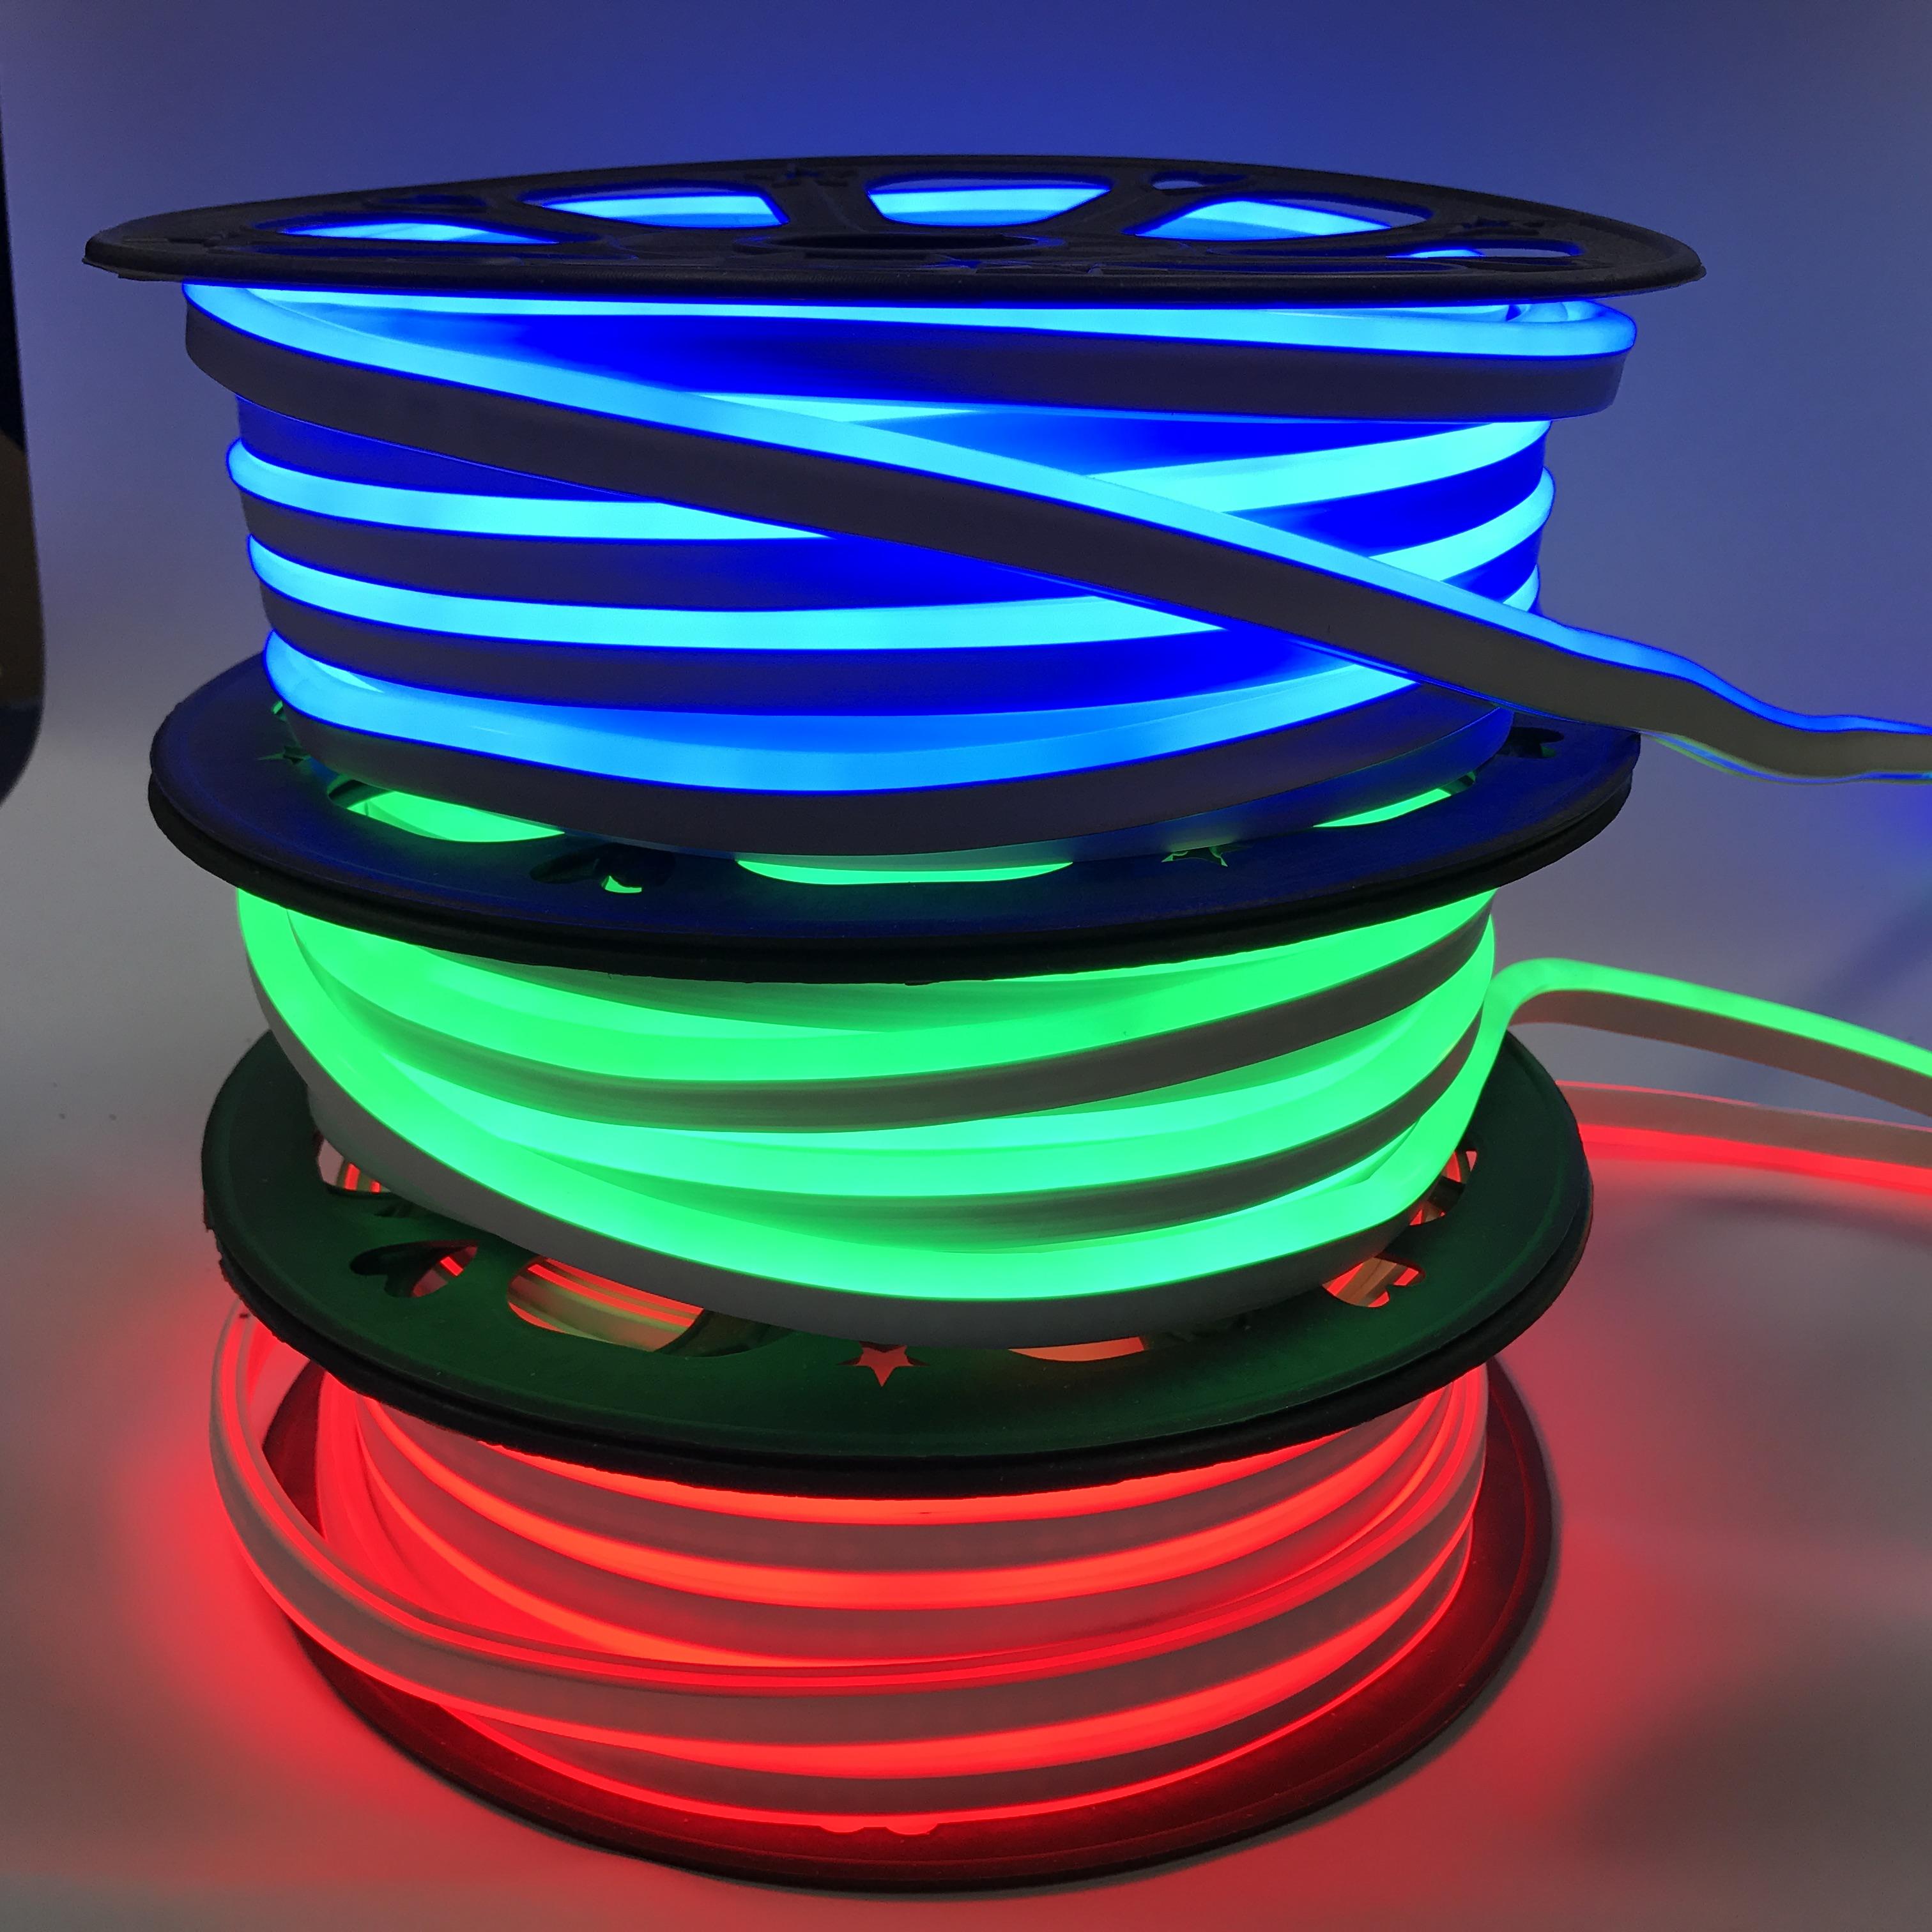 IP65 IP y CE RoHS certificación RGB led emisor de neón de tira flexible